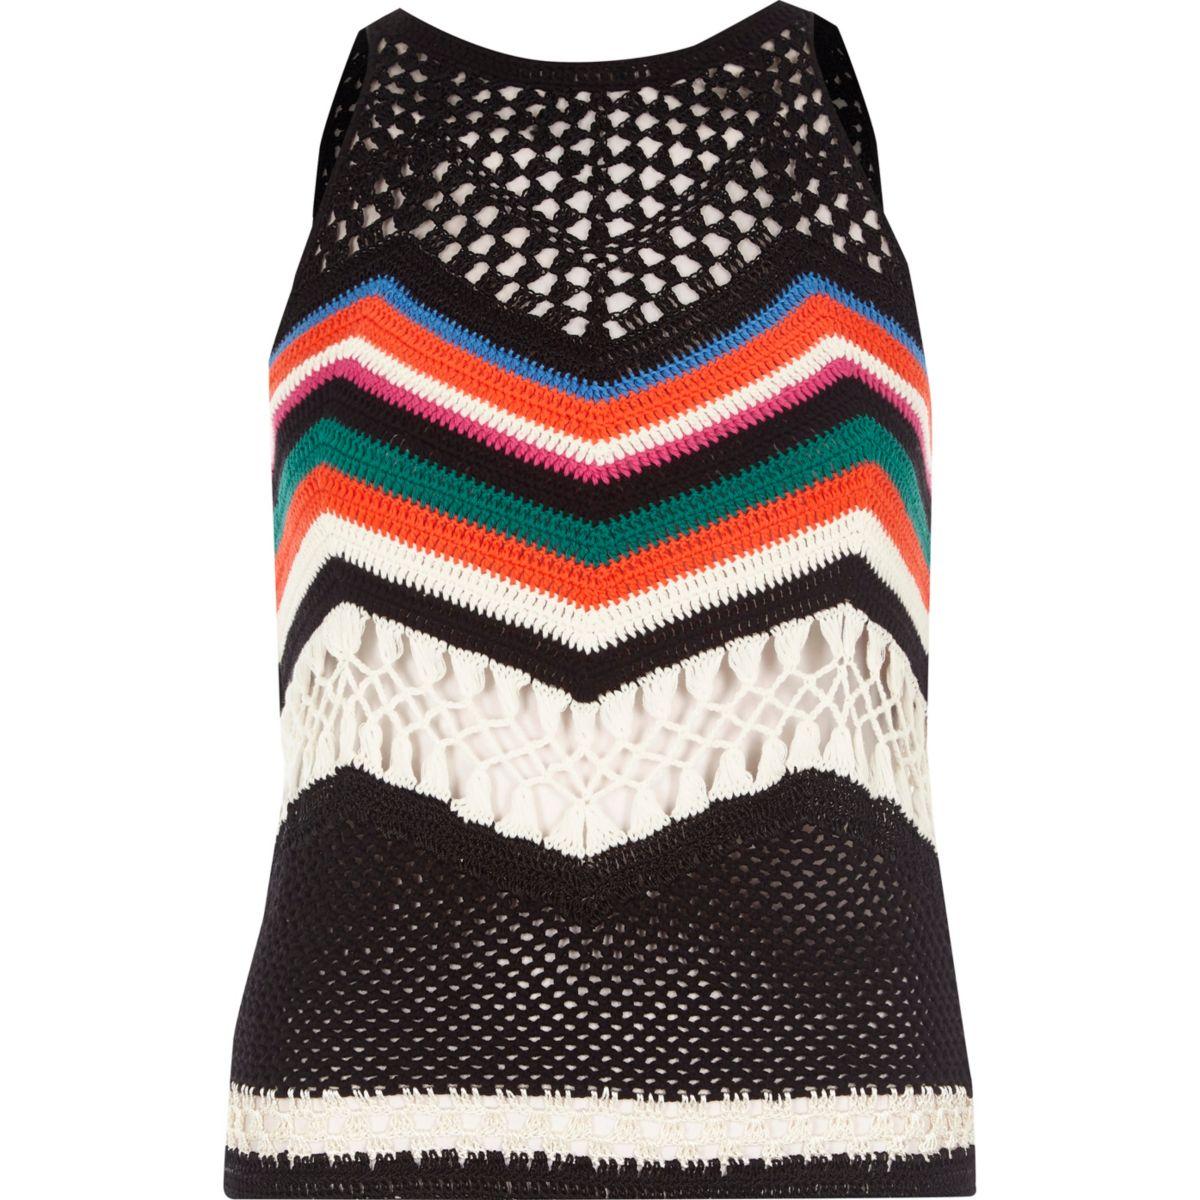 Black multi colored crochet open back top